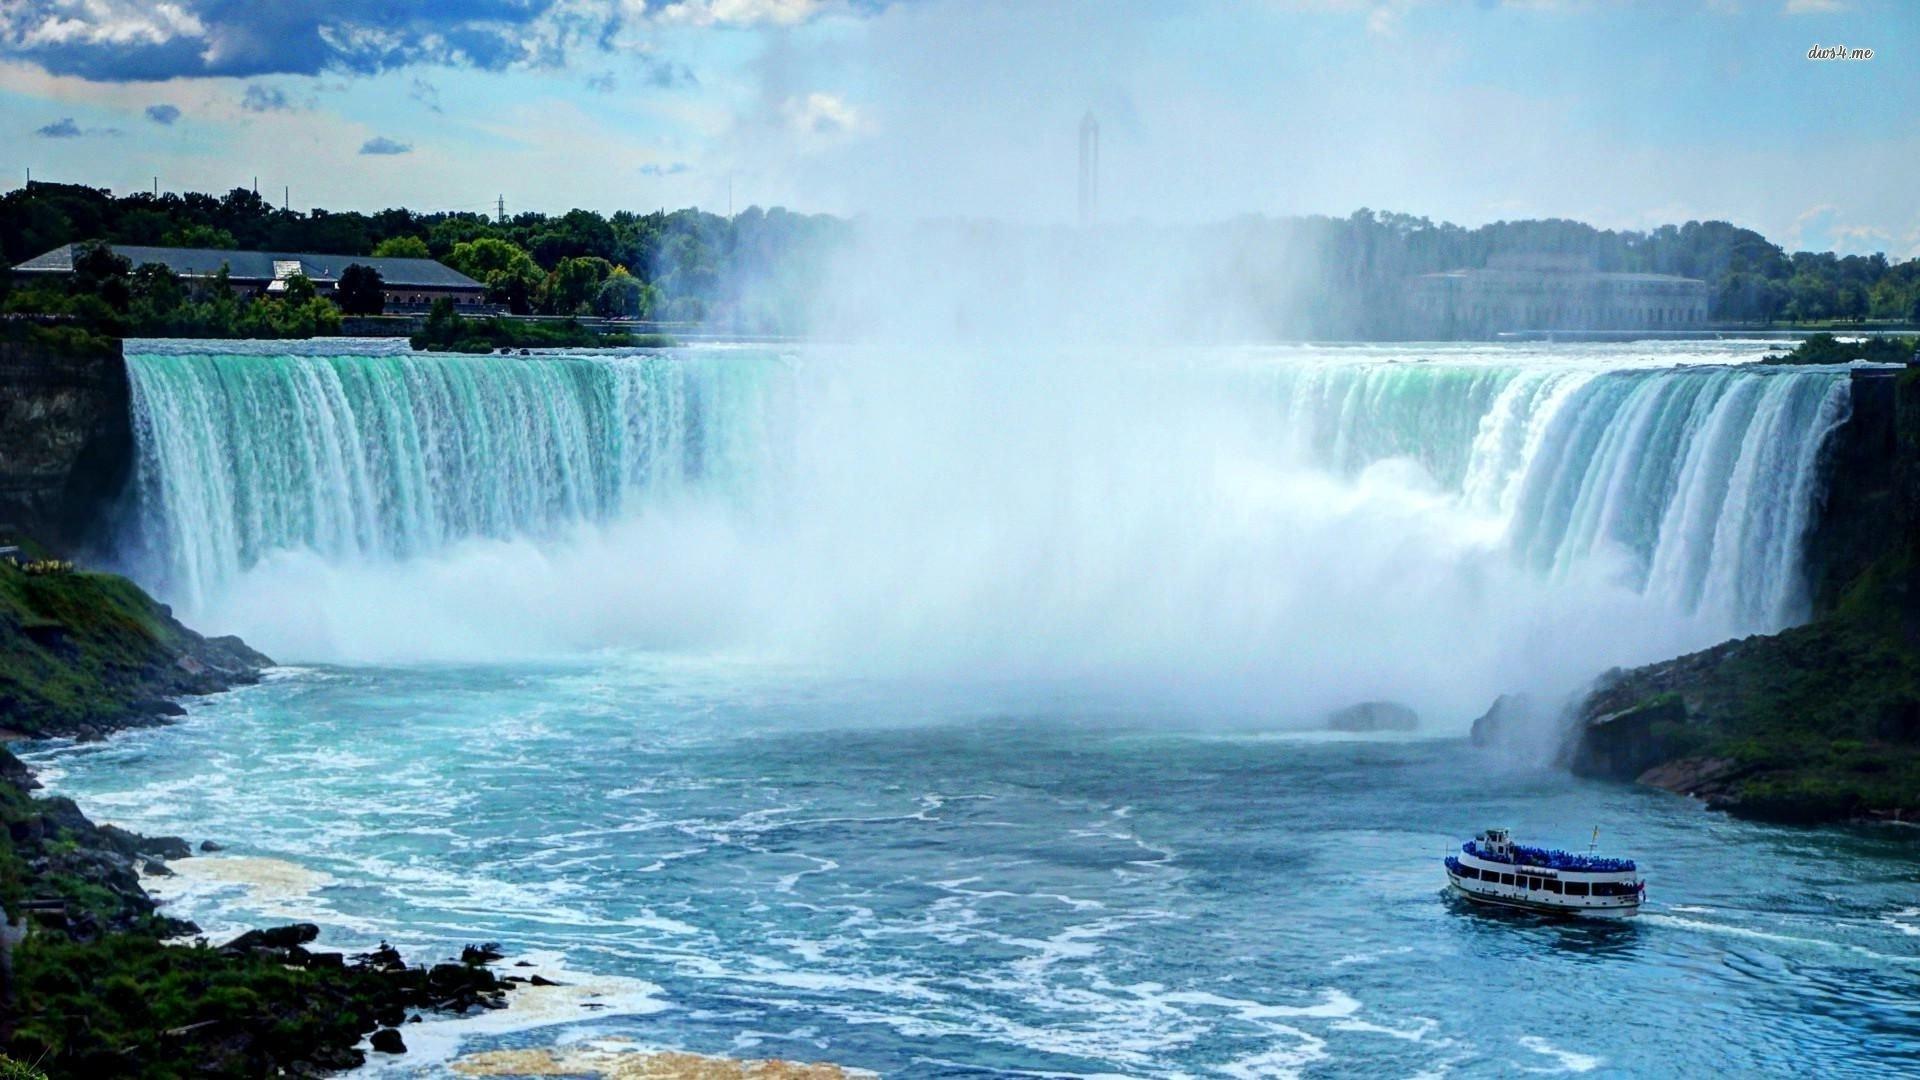 33 Niagara Falls Hd Wallpapers Background Images